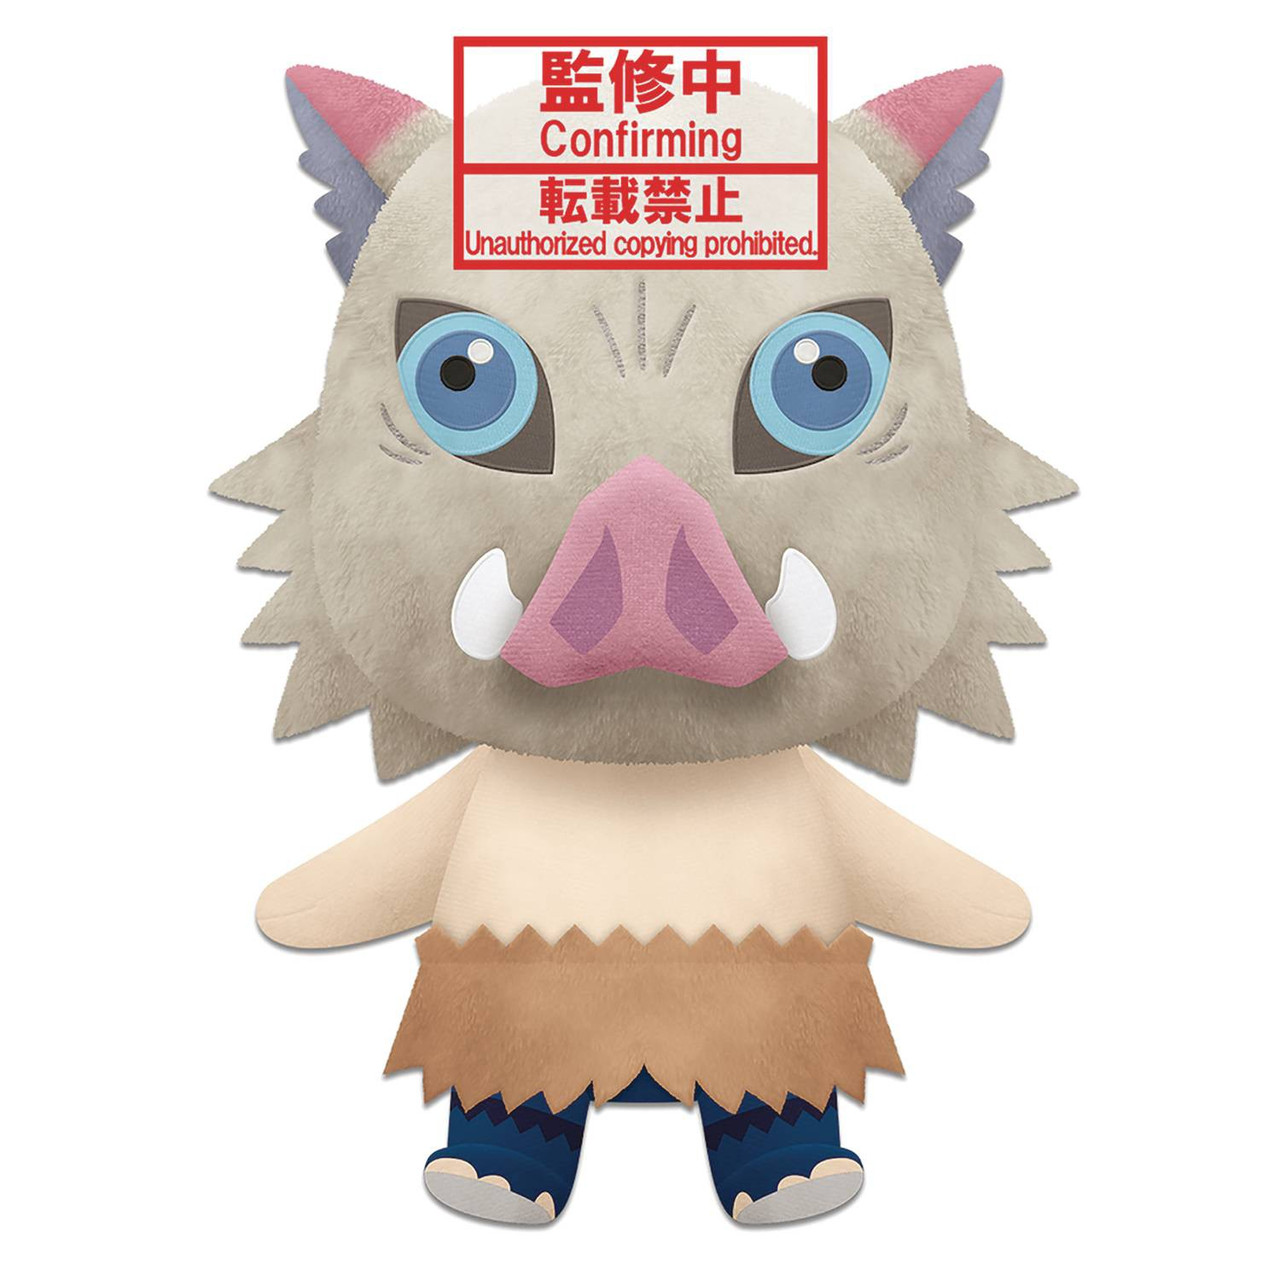 Kimetsu no Yaiba Inosuke Hashibira/'s Boar Headgear Plush Hat Demon Slayer